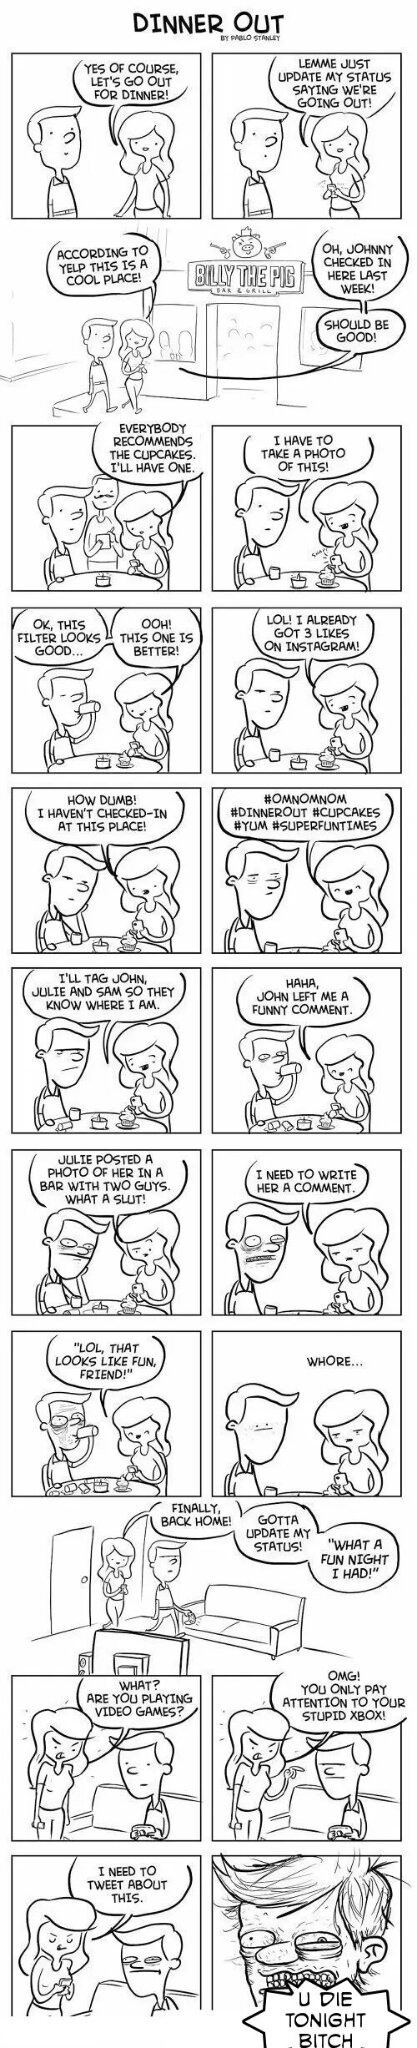 The Girlfriend - meme